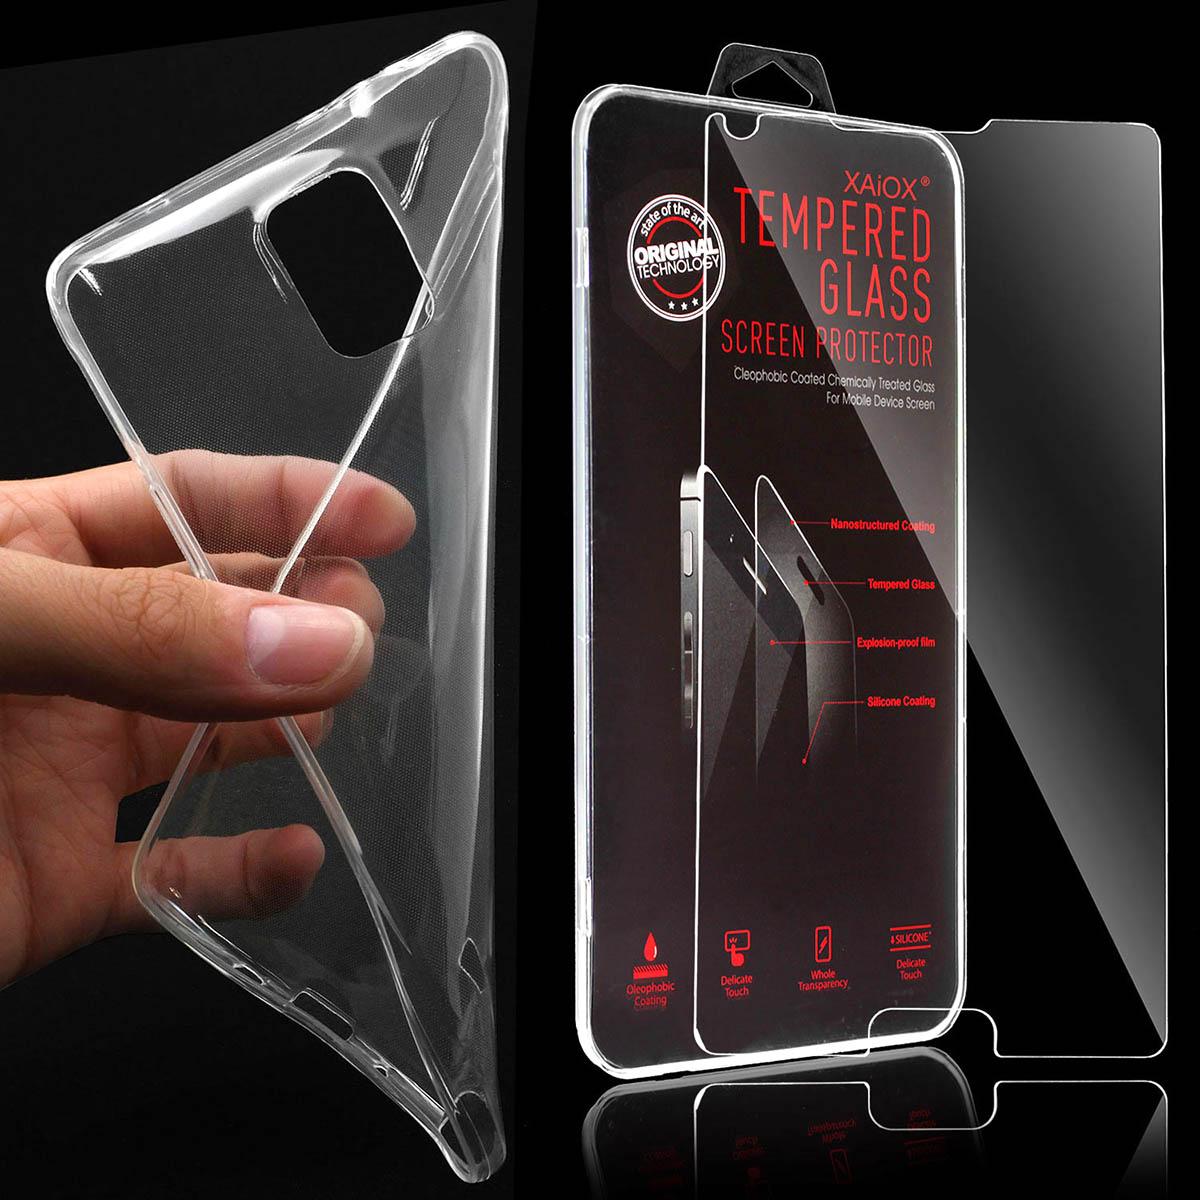 Handyhuelle-Schutz-Huelle-Tasche-Cover-Silikon-Bumper-PANZERGLAS-Schutzfolie